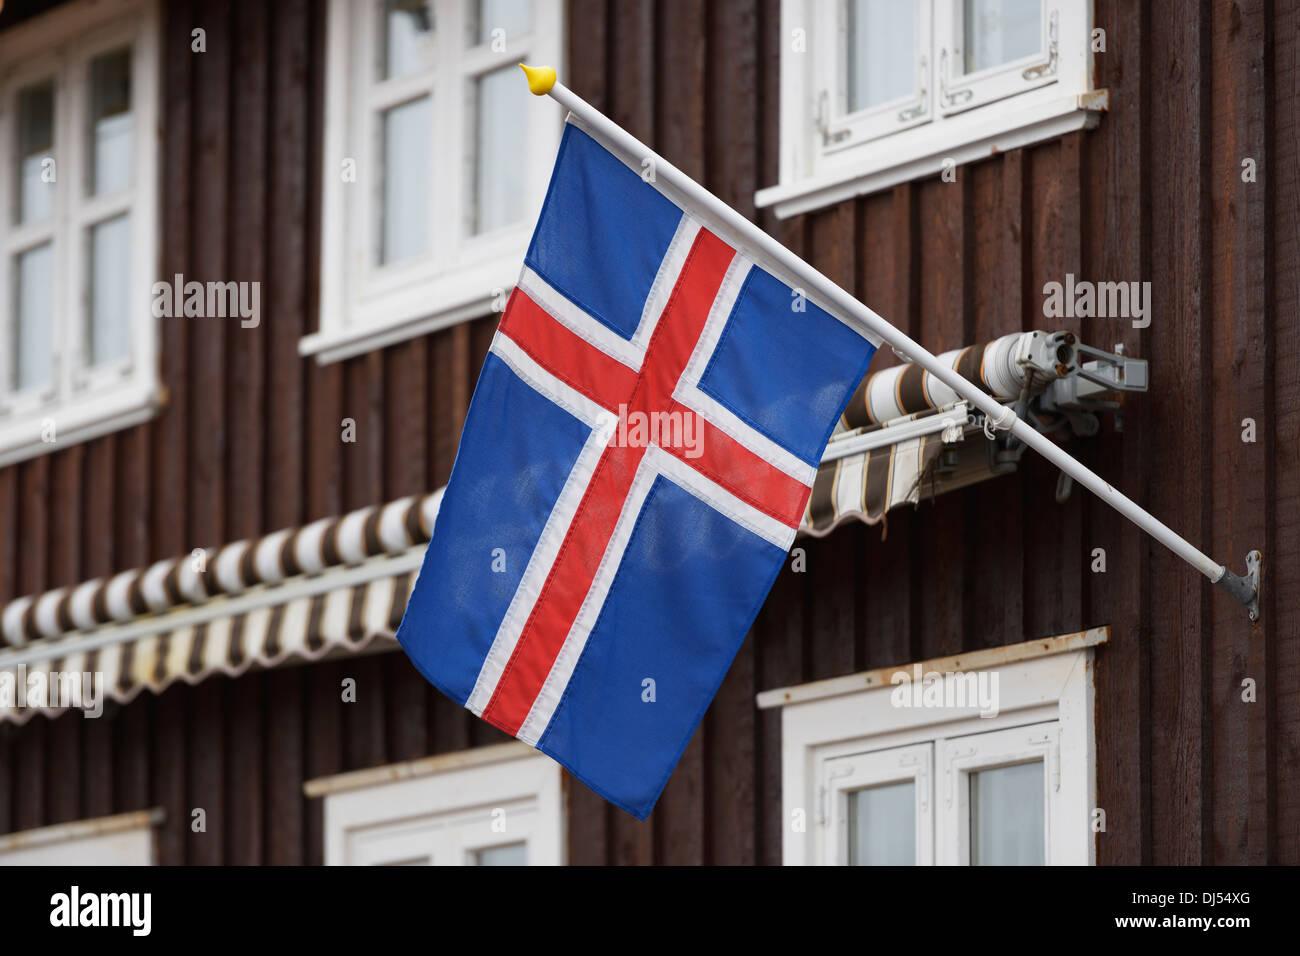 Icelandic Flag On A House; Stykisholmur, Snaefellsnes, Iceland - Stock Image